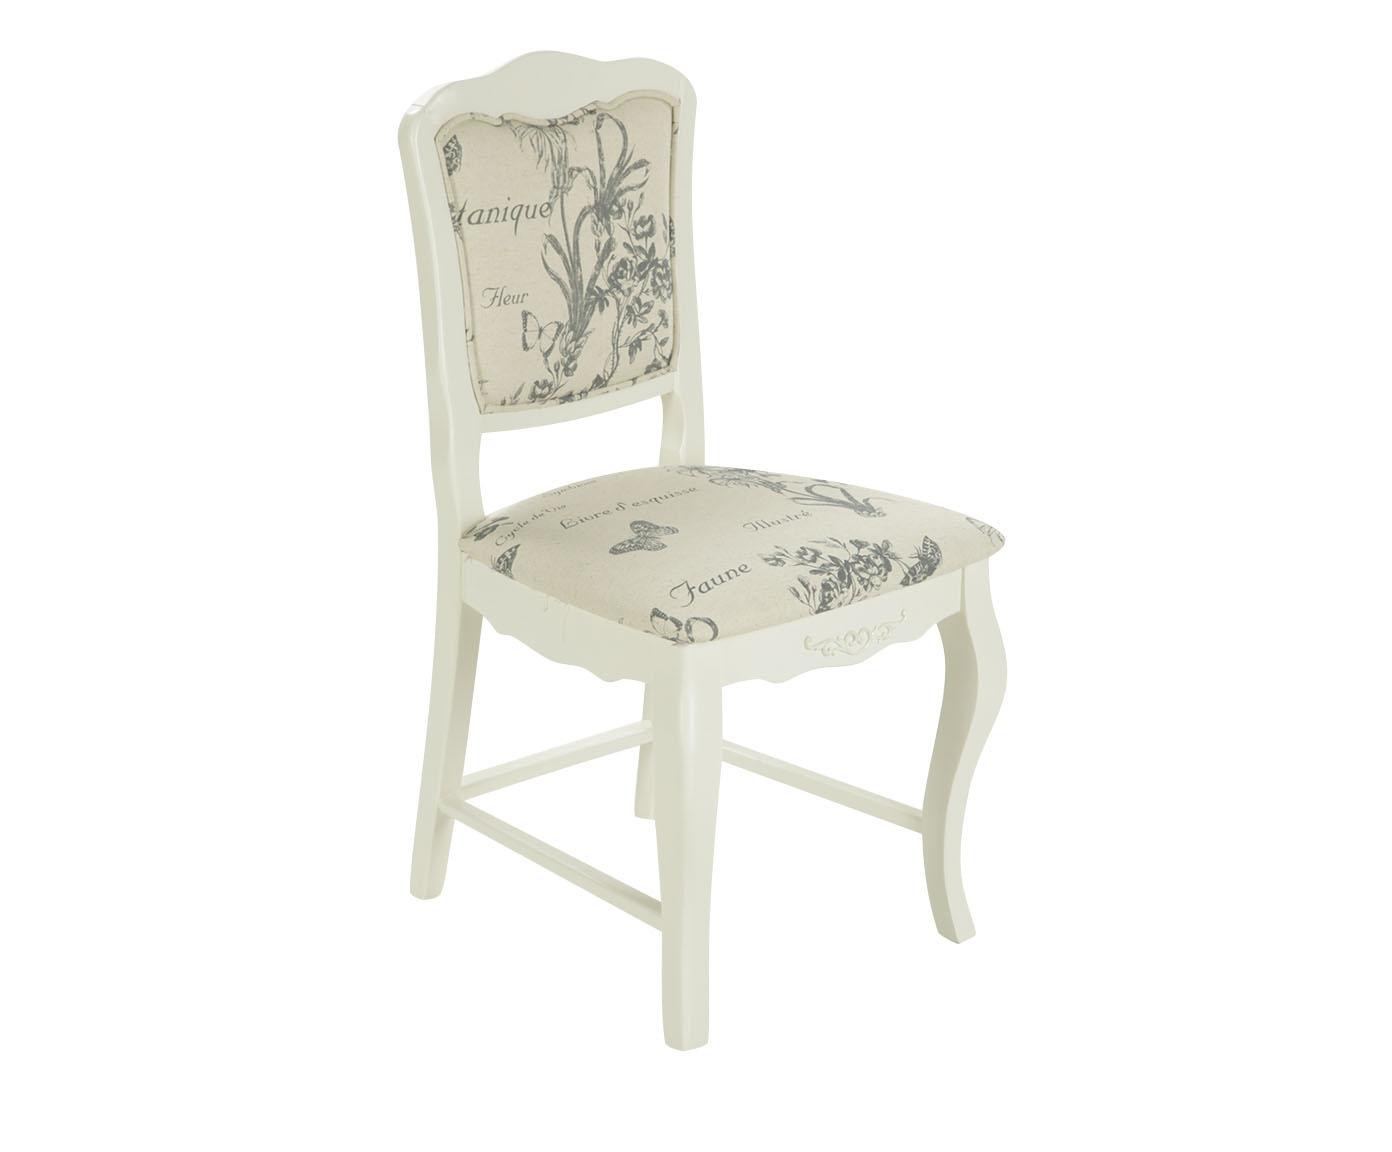 СтулОбеденные стулья<br><br><br>Material: Бук<br>Width см: 50<br>Depth см: 46<br>Height см: 90